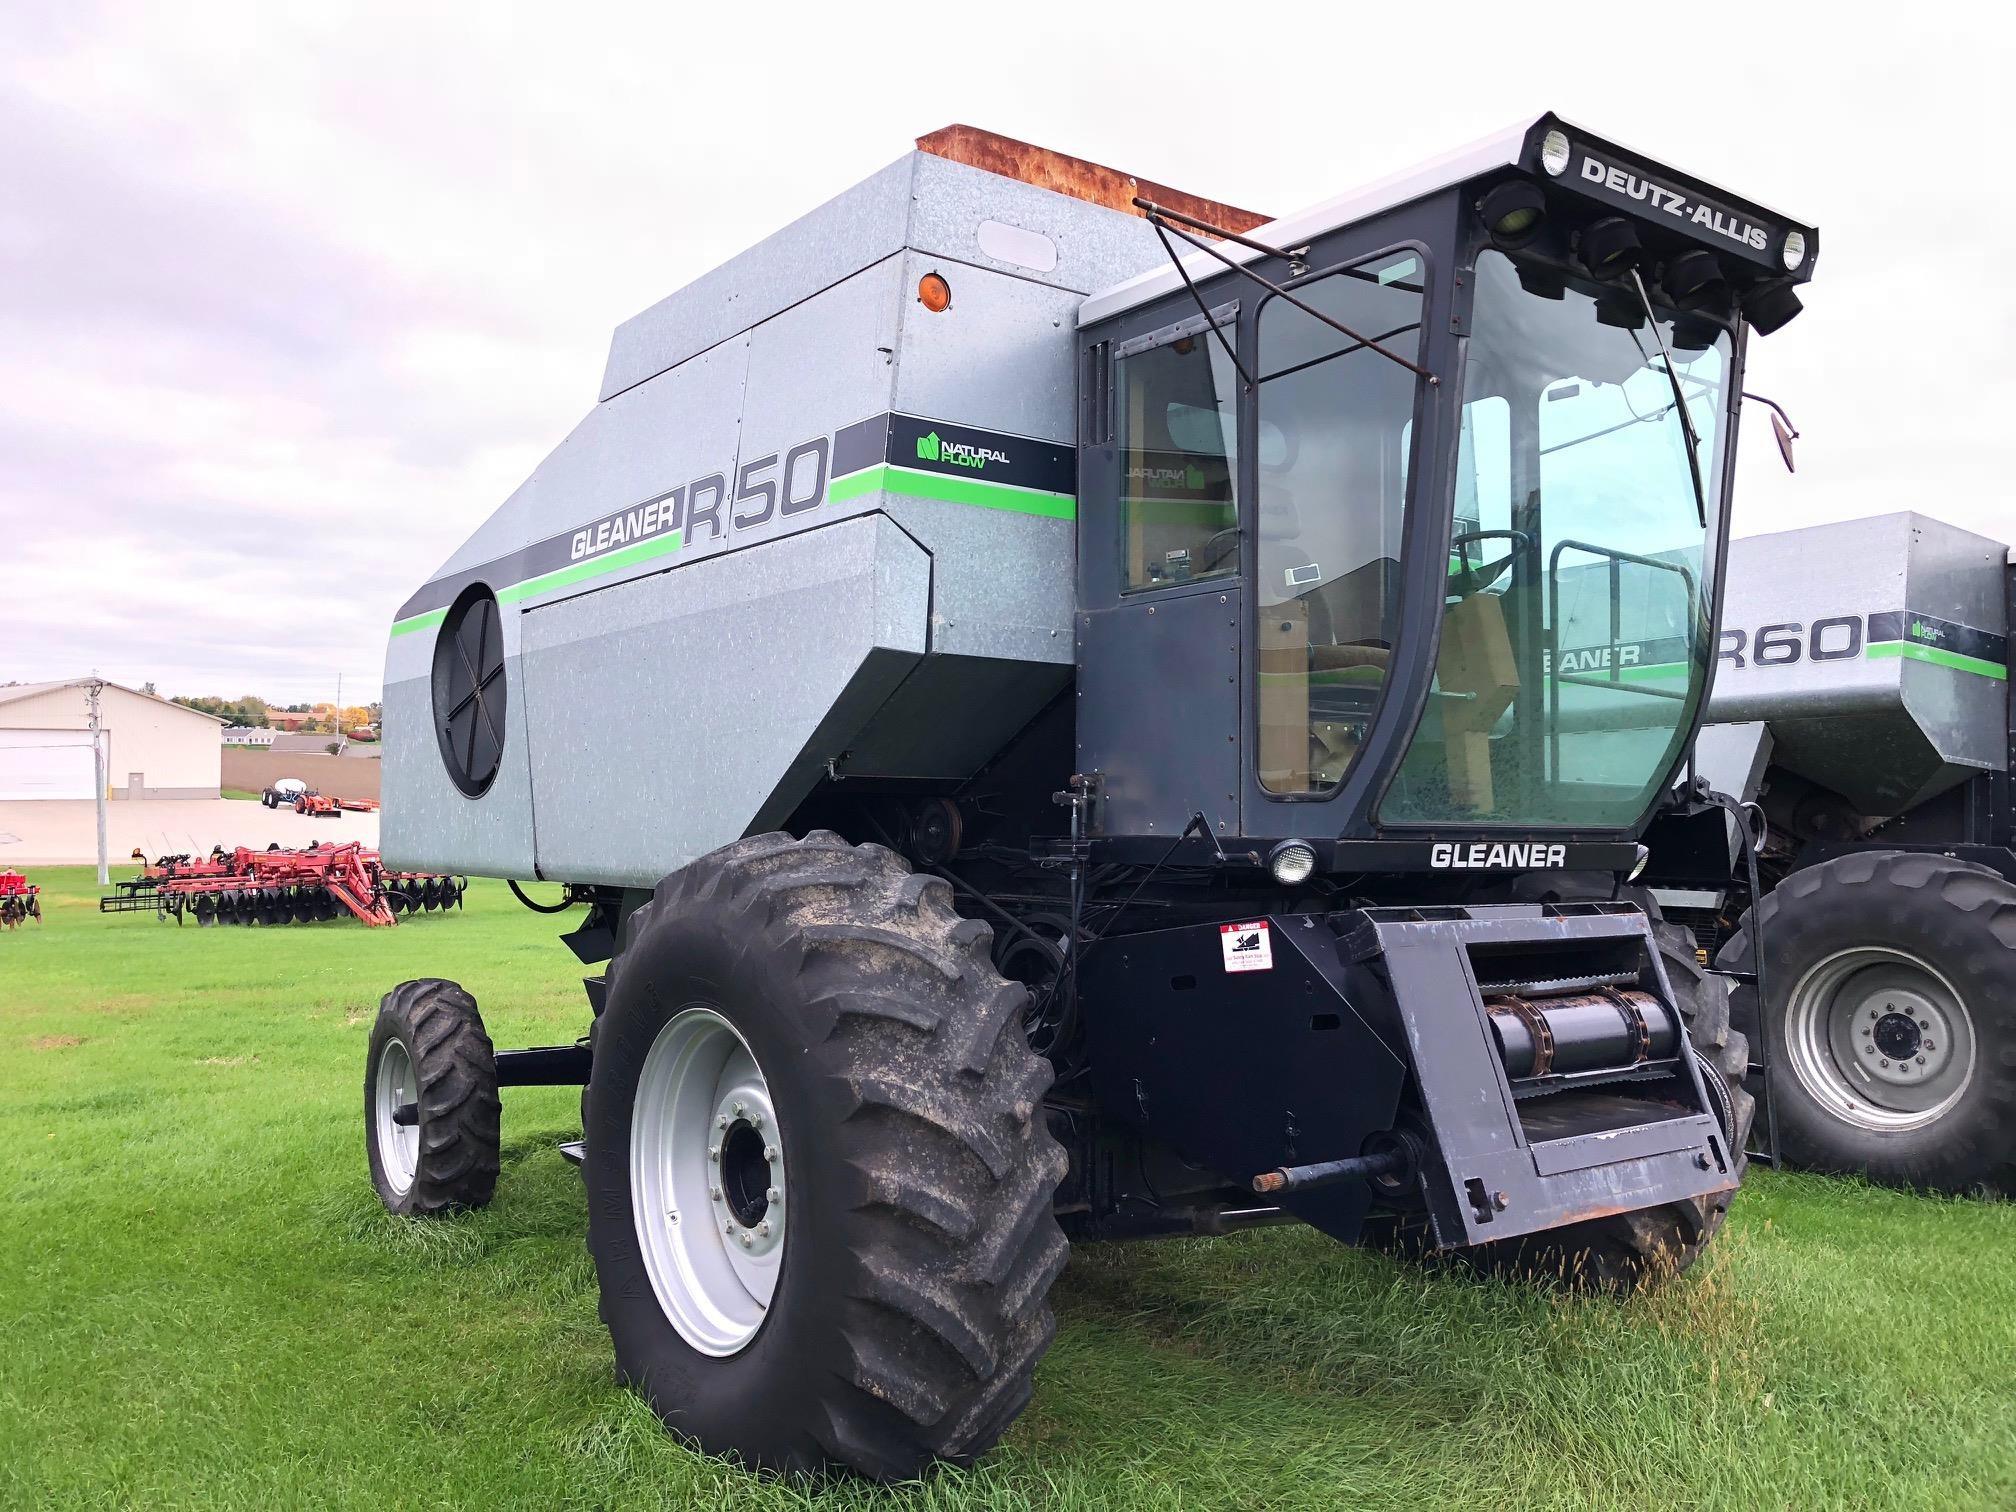 1988 Gleaner R50 Combine